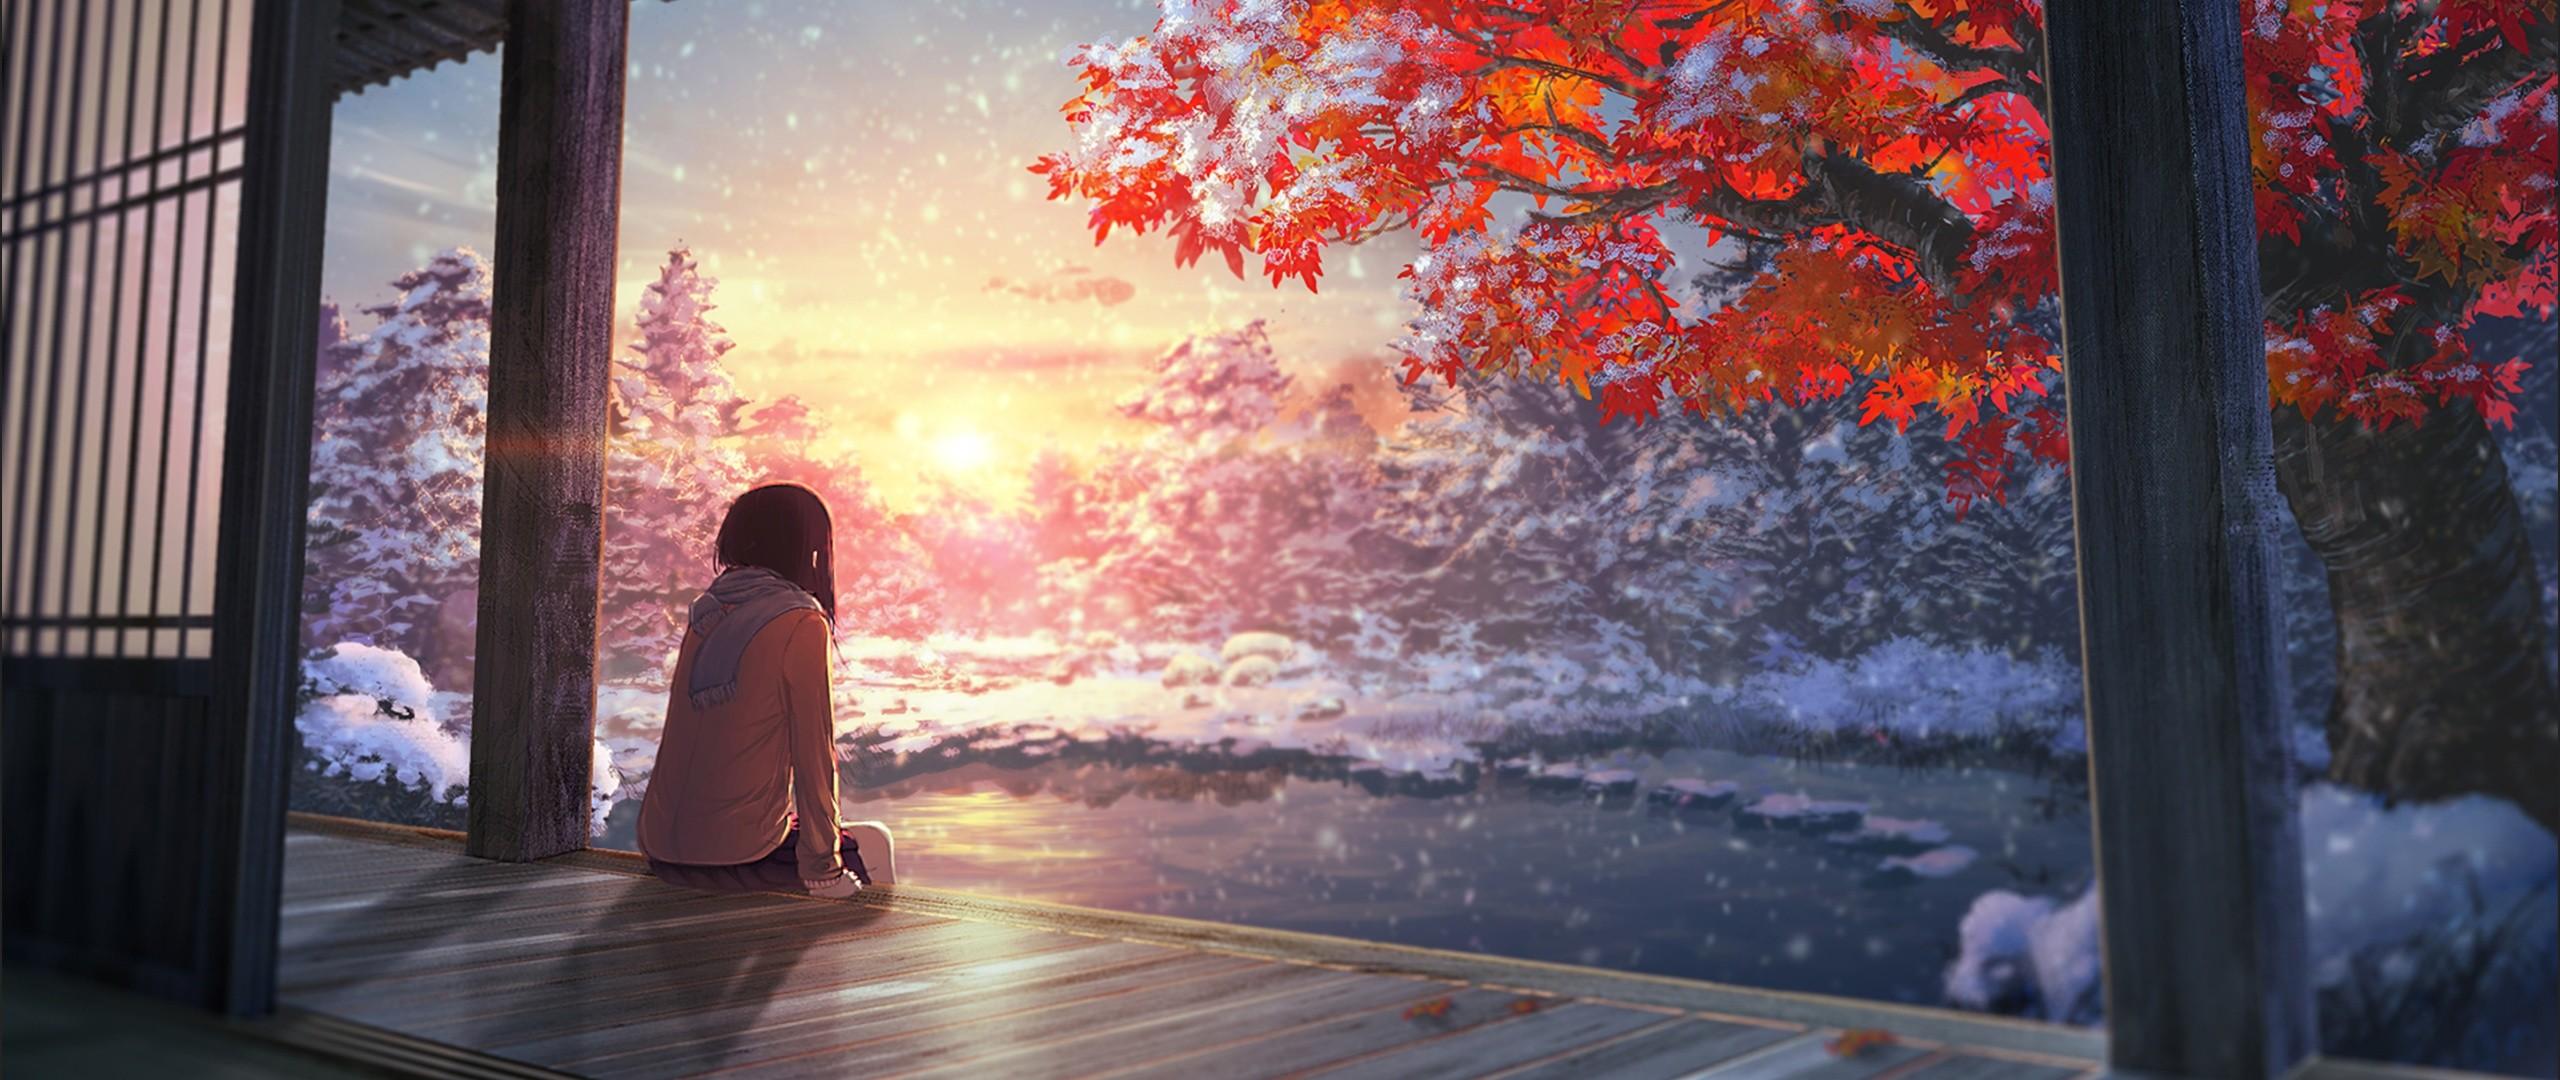 Anime landscape tree y girl cute long hair wallpaper | | 1090477  | WallpaperUP